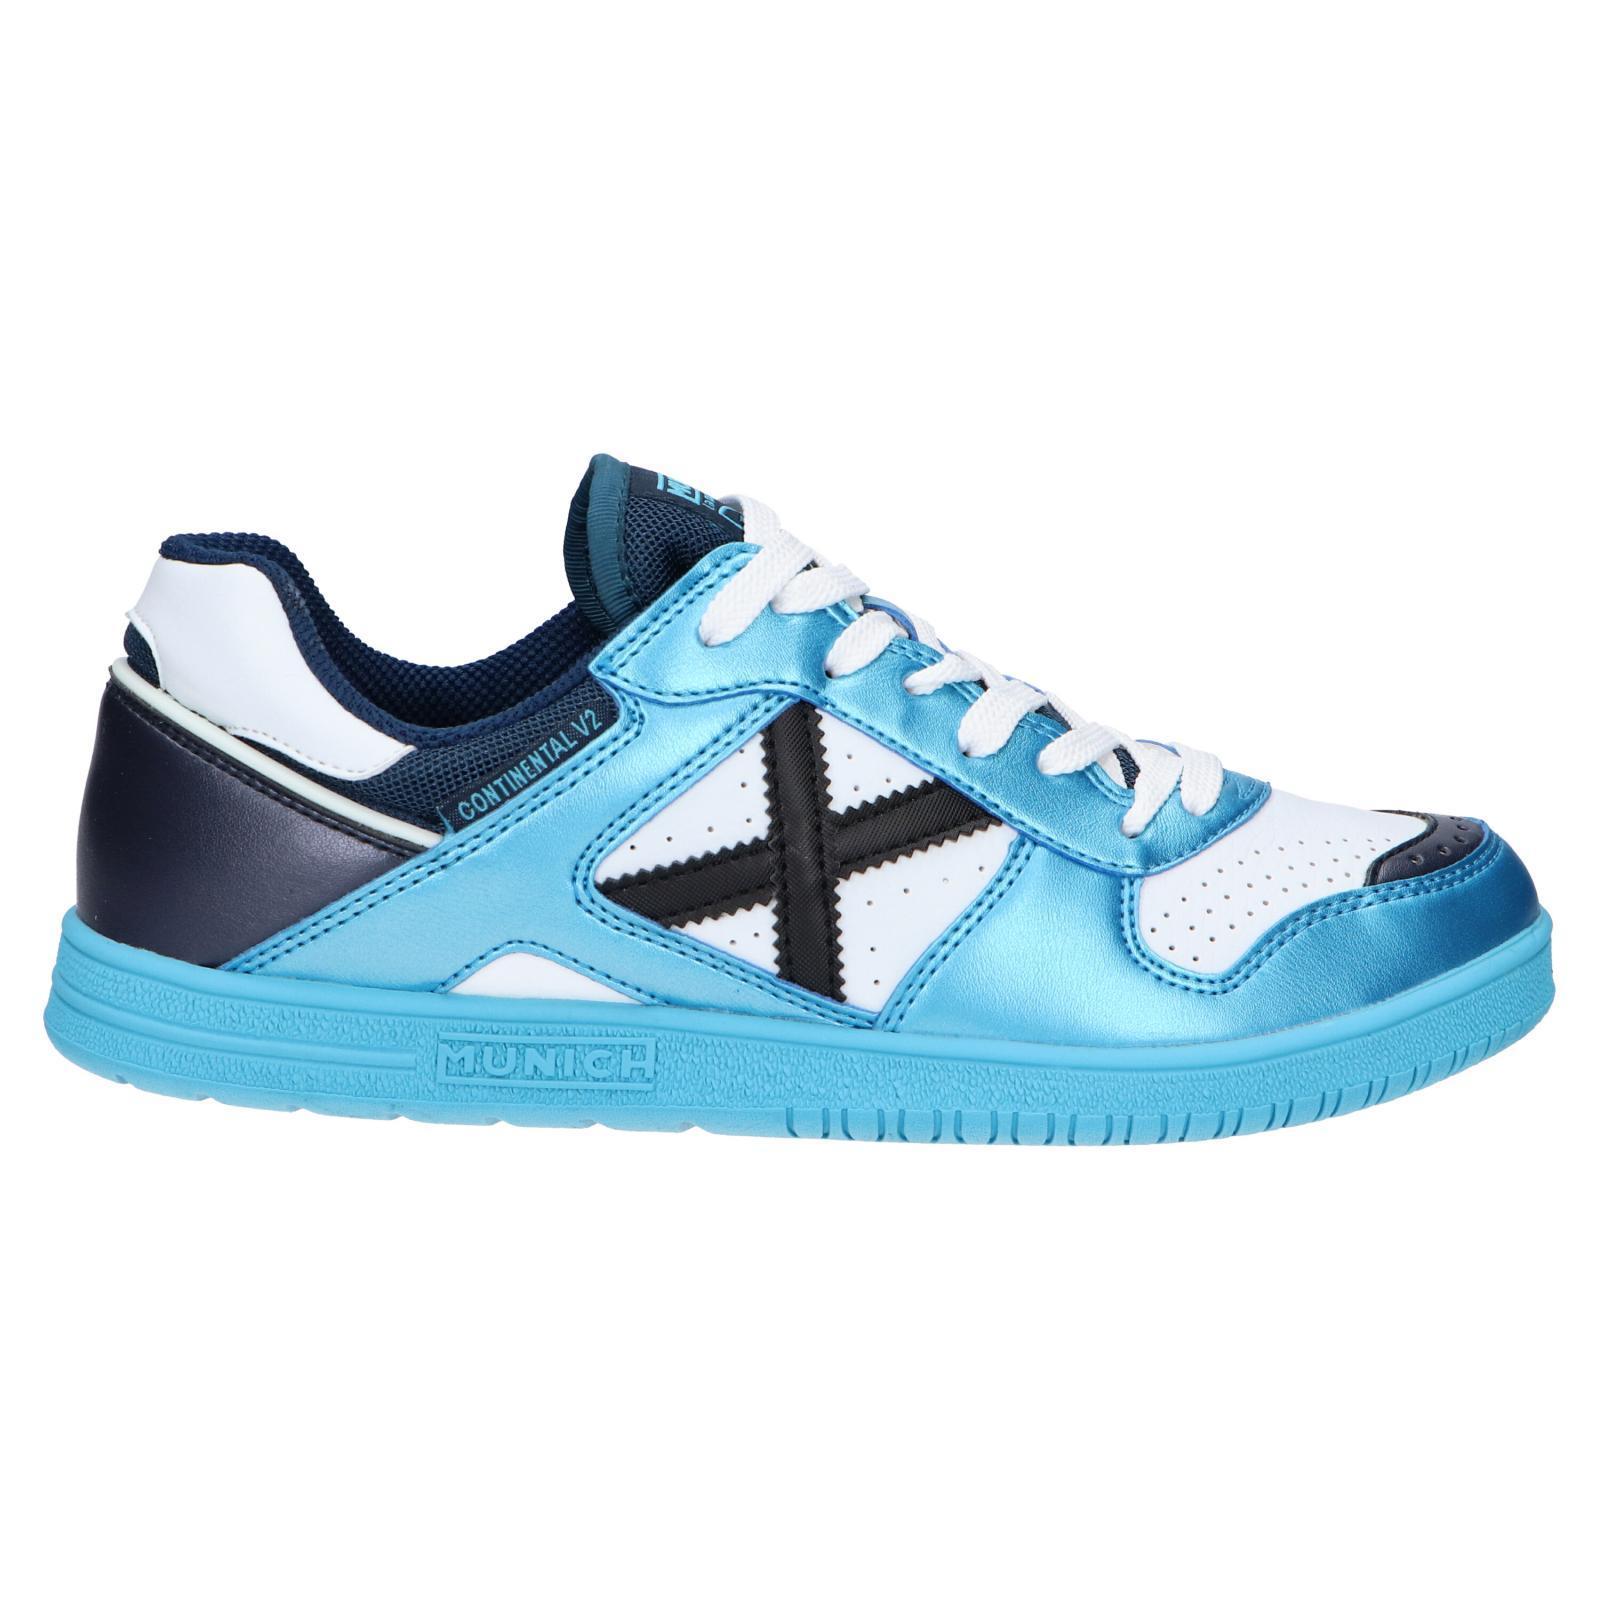 Zapatillas munich continental v2 azul